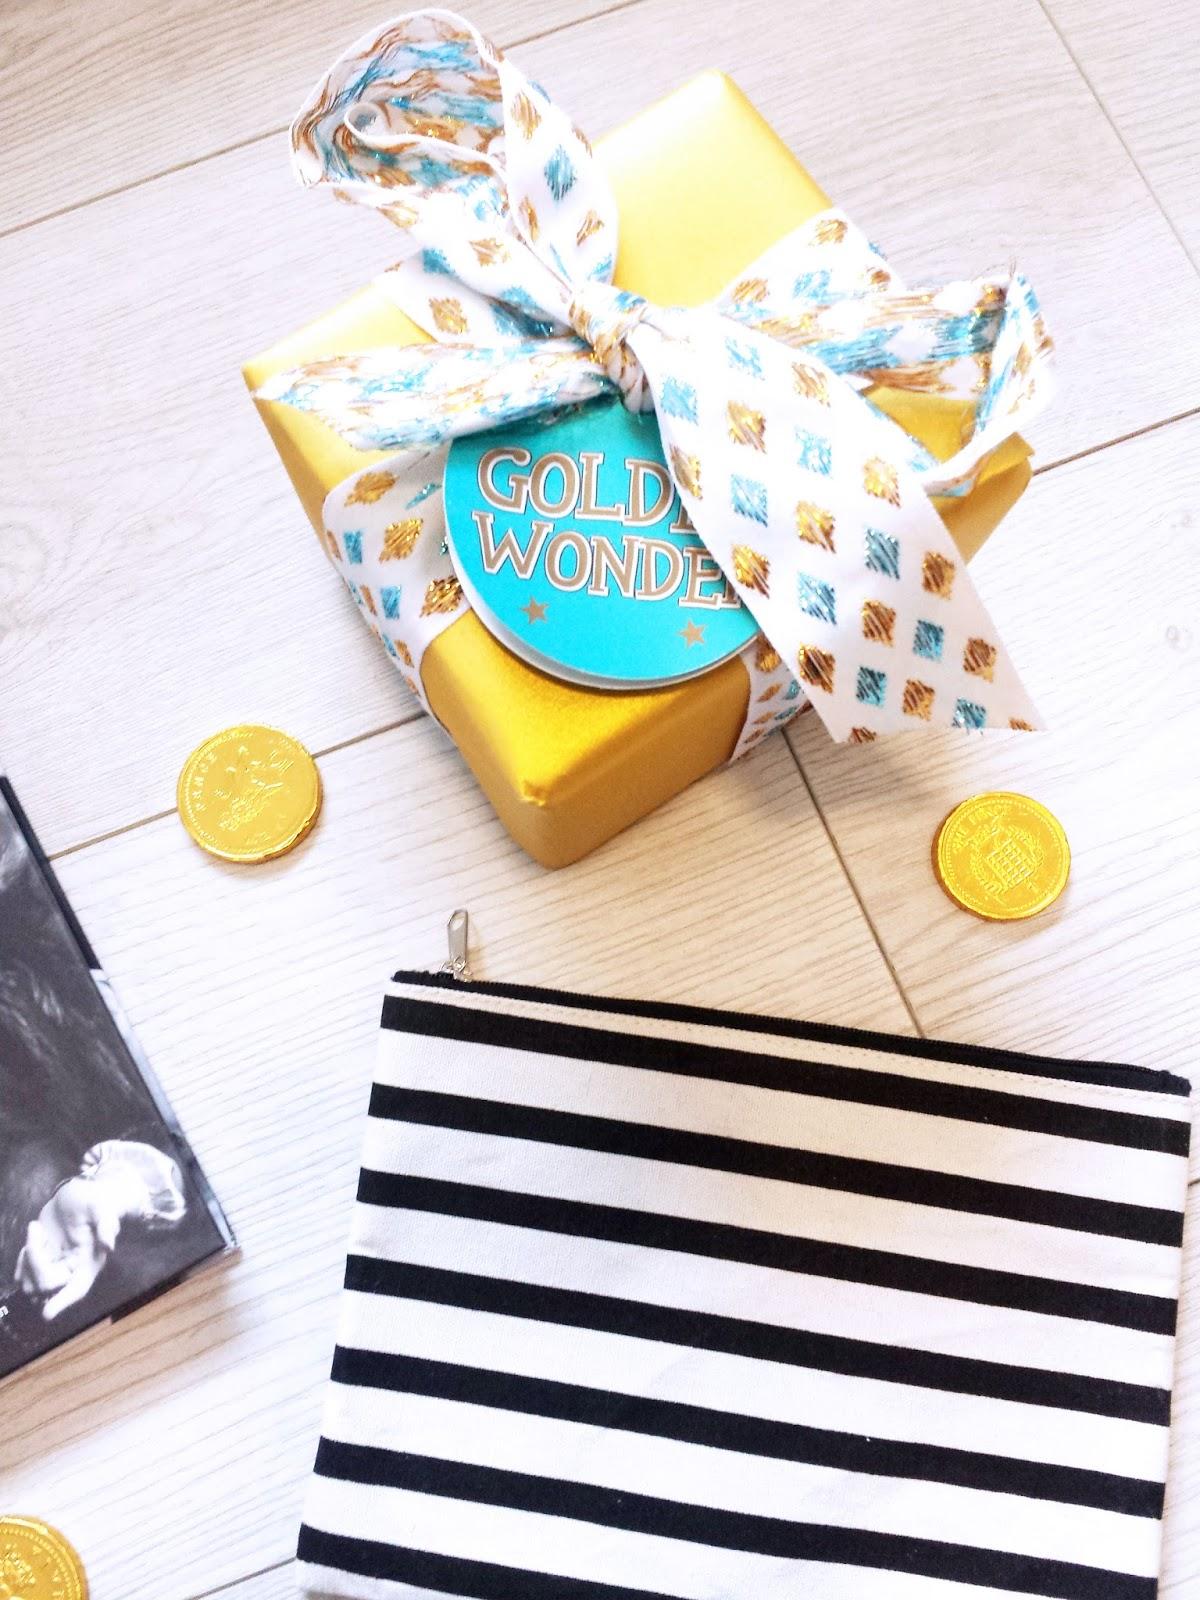 Lush Golden Wonder Gift Box